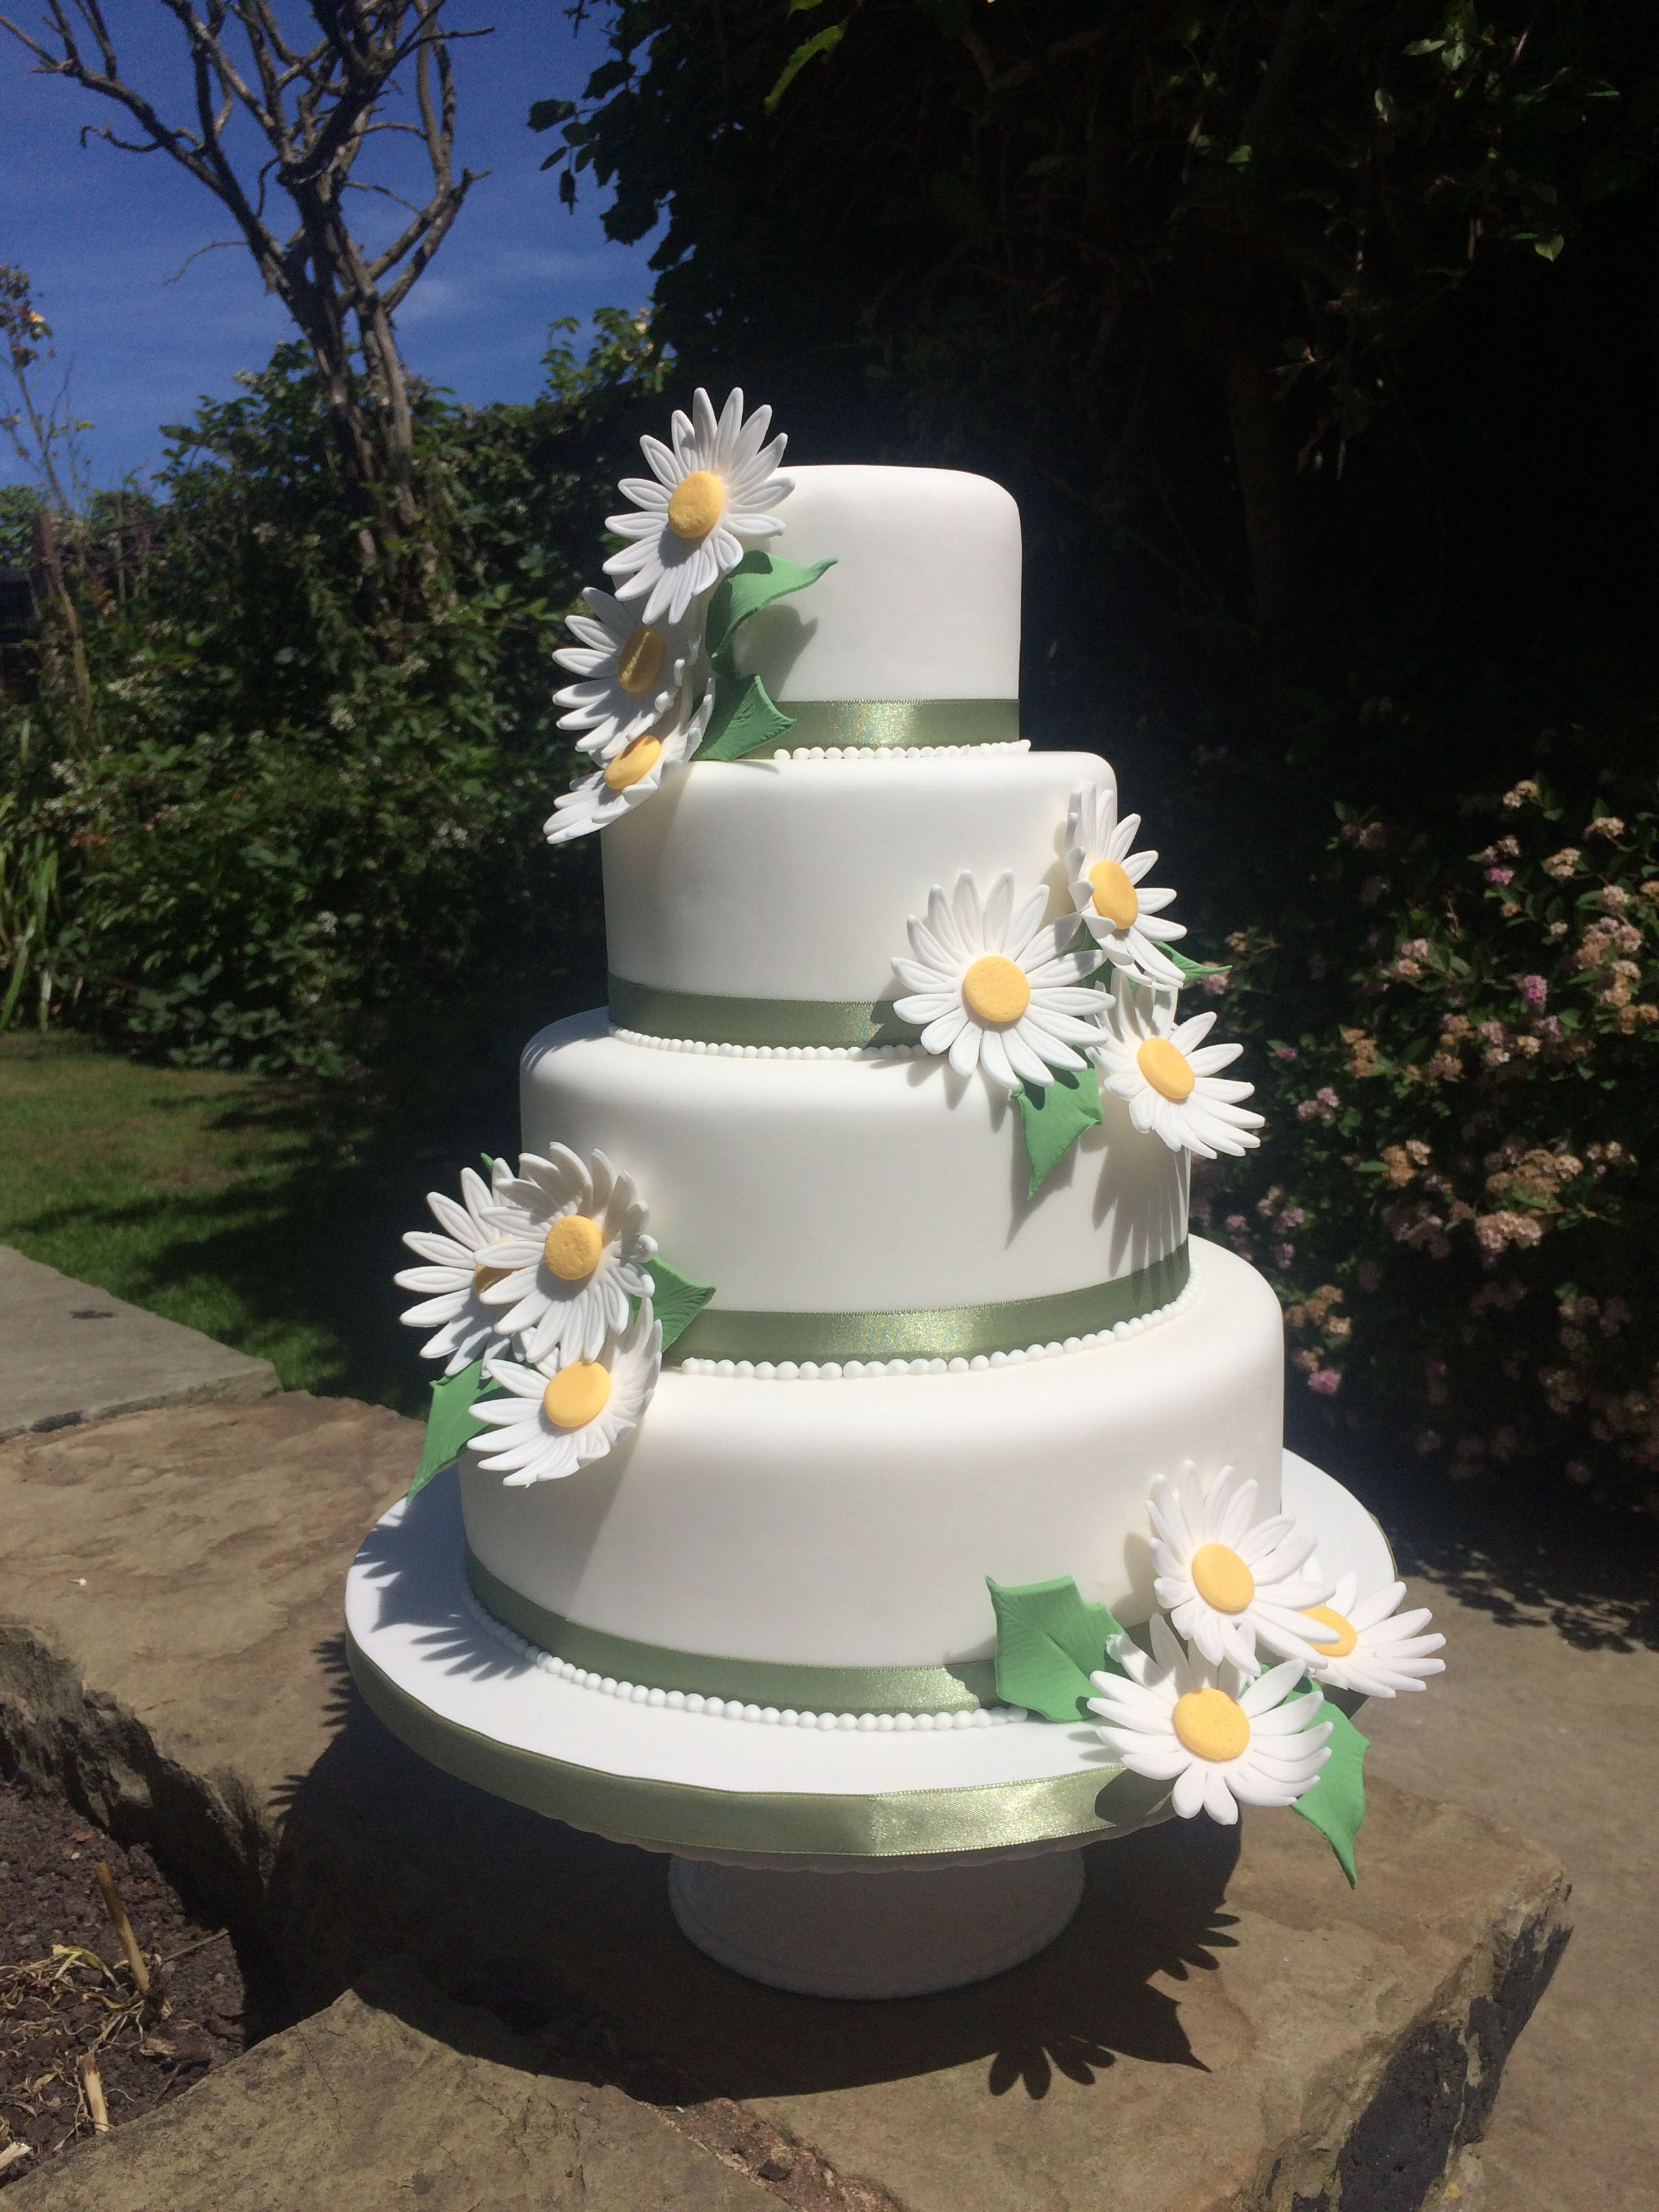 Pin by eva barrantes on wedding cake in pinterest cake